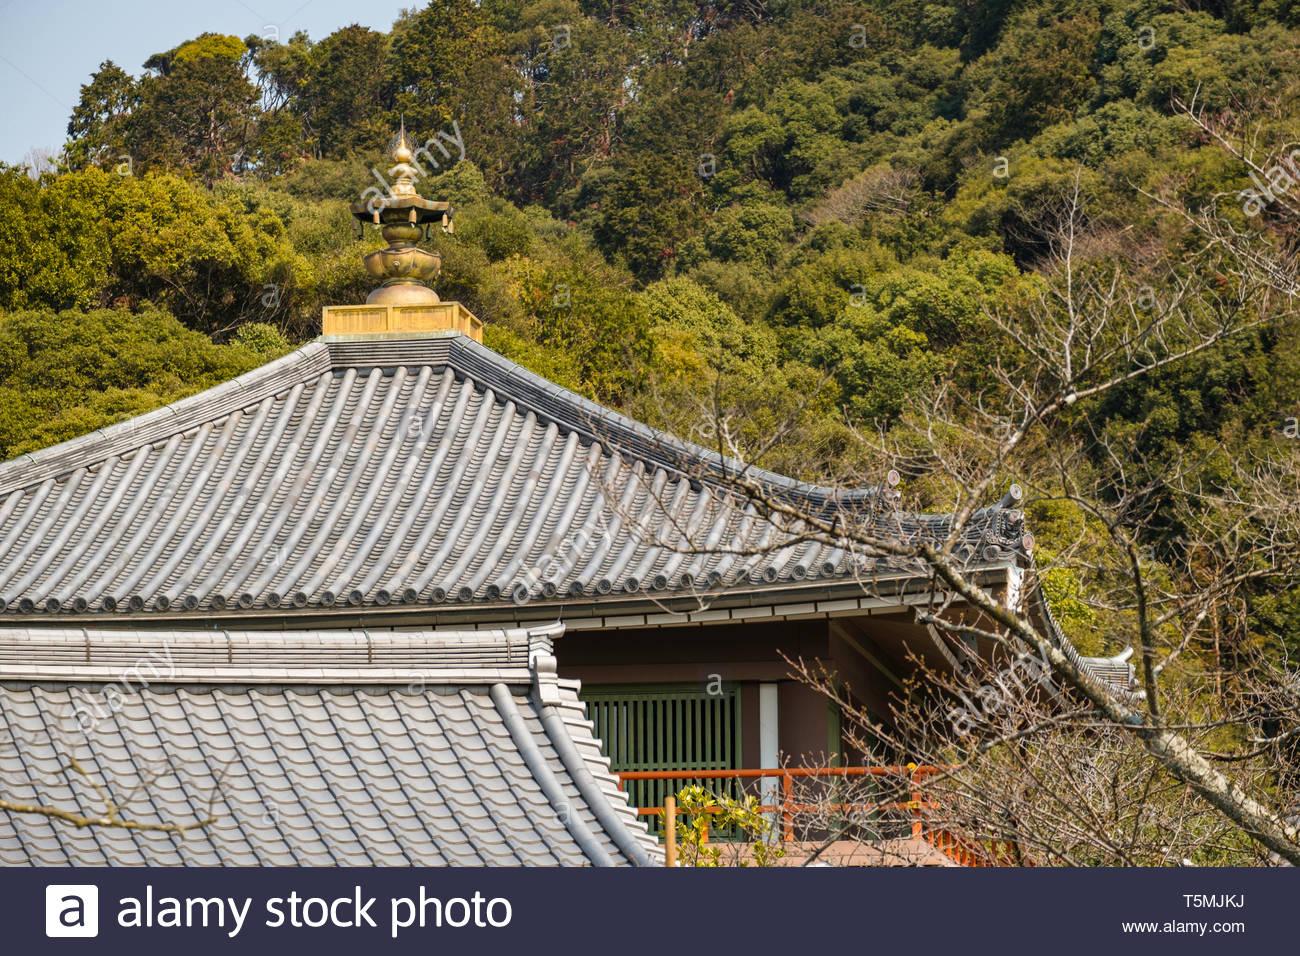 Classic ceramic tiled roofs in the traditional Japanese architectural style on the grounds of the Kiyomizu-dera Temple, Kiyomizu, Higashiyama-ku, Kyot - Stock Image